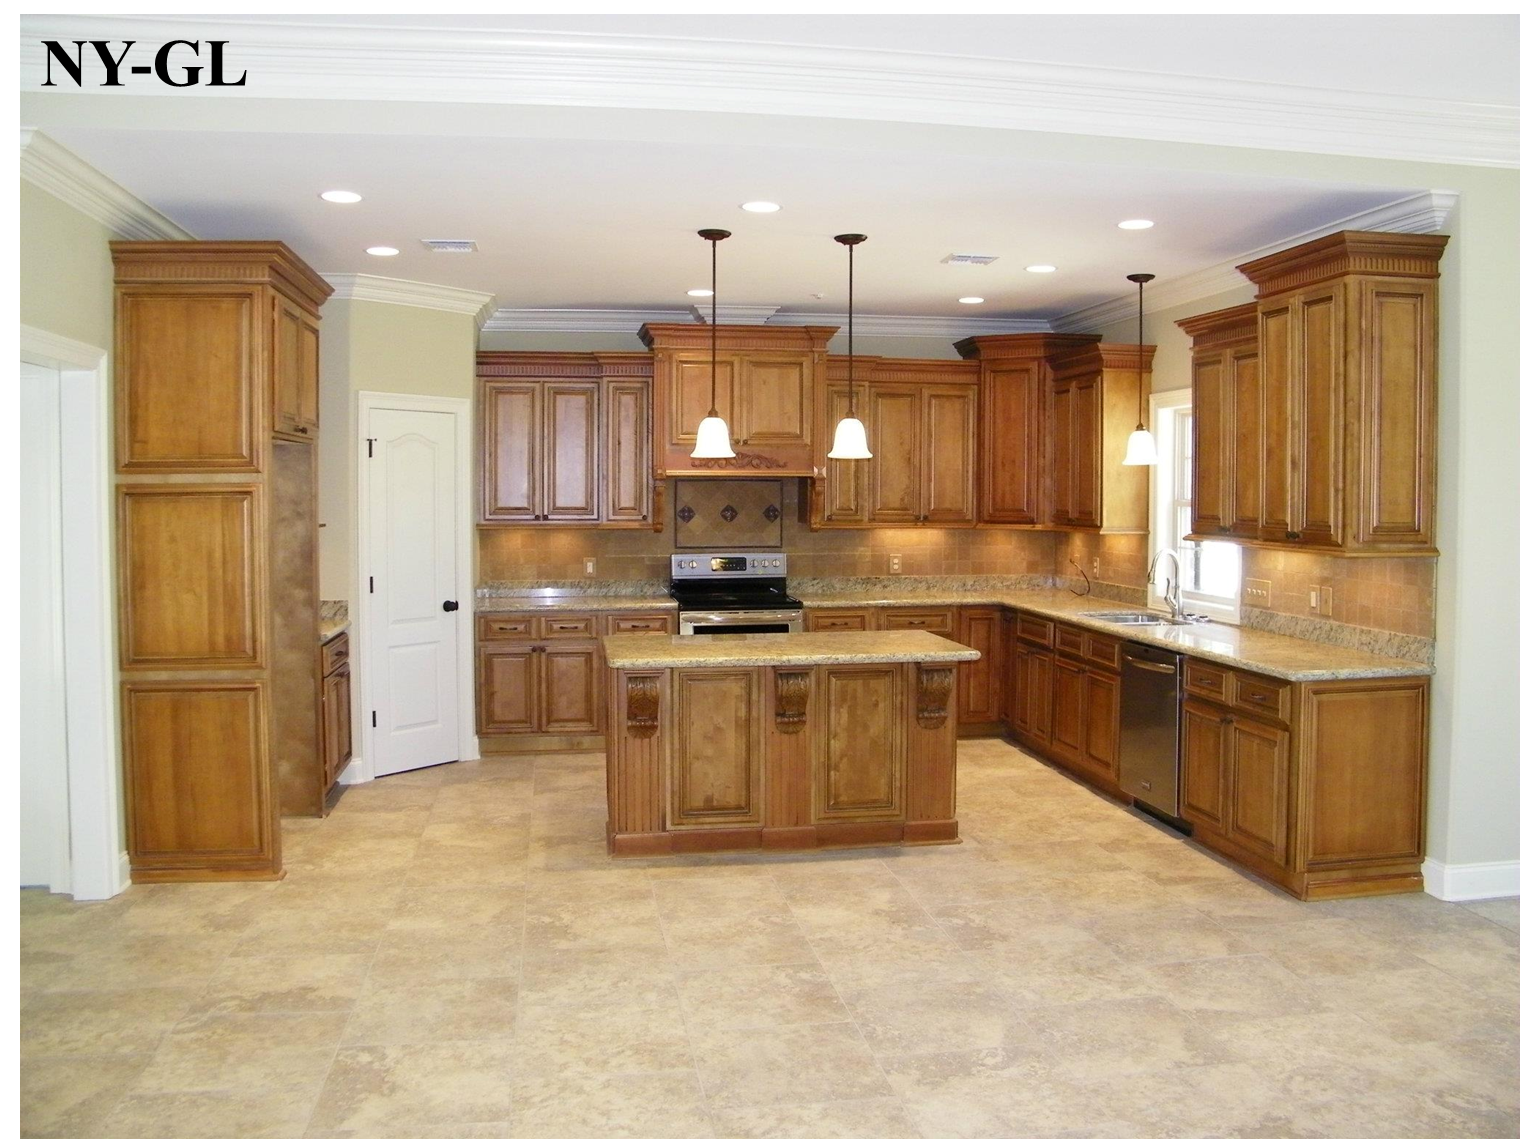 Kitchen cabinets new york glaze ny gl gallery rta for Cheap kitchen cabinets ny